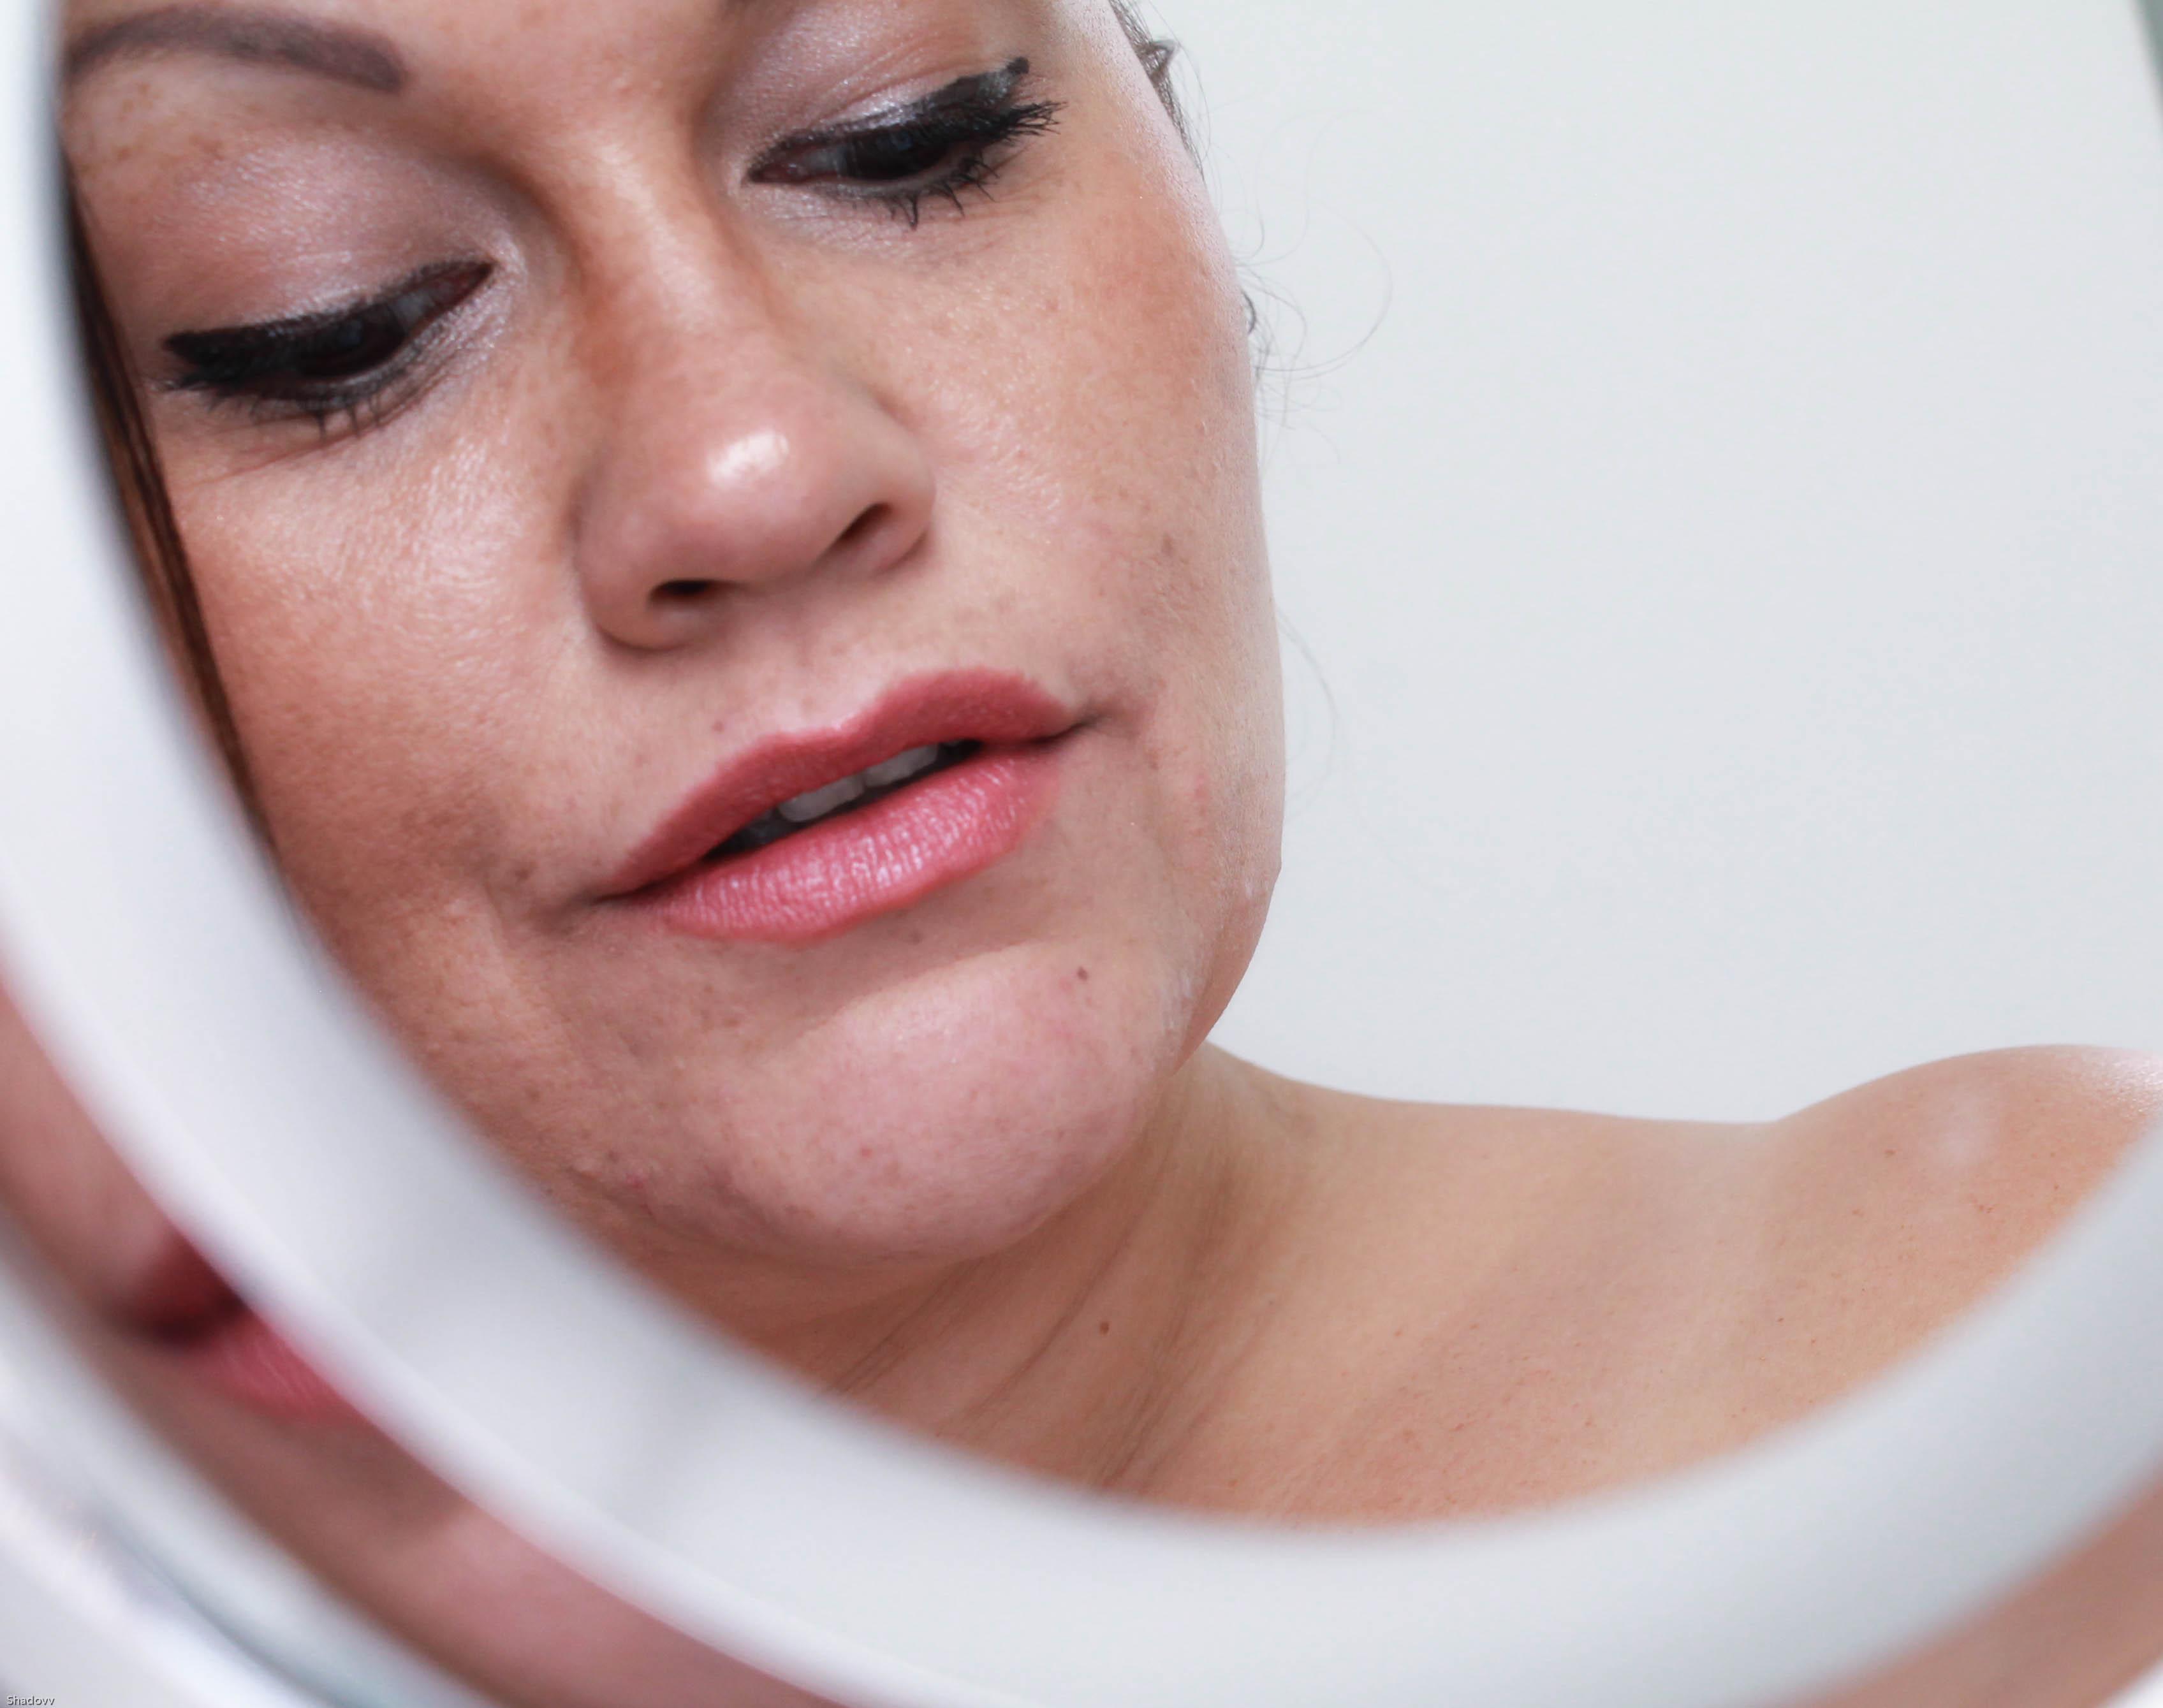 lippenstift guerlain peach lipstick kardiaserena